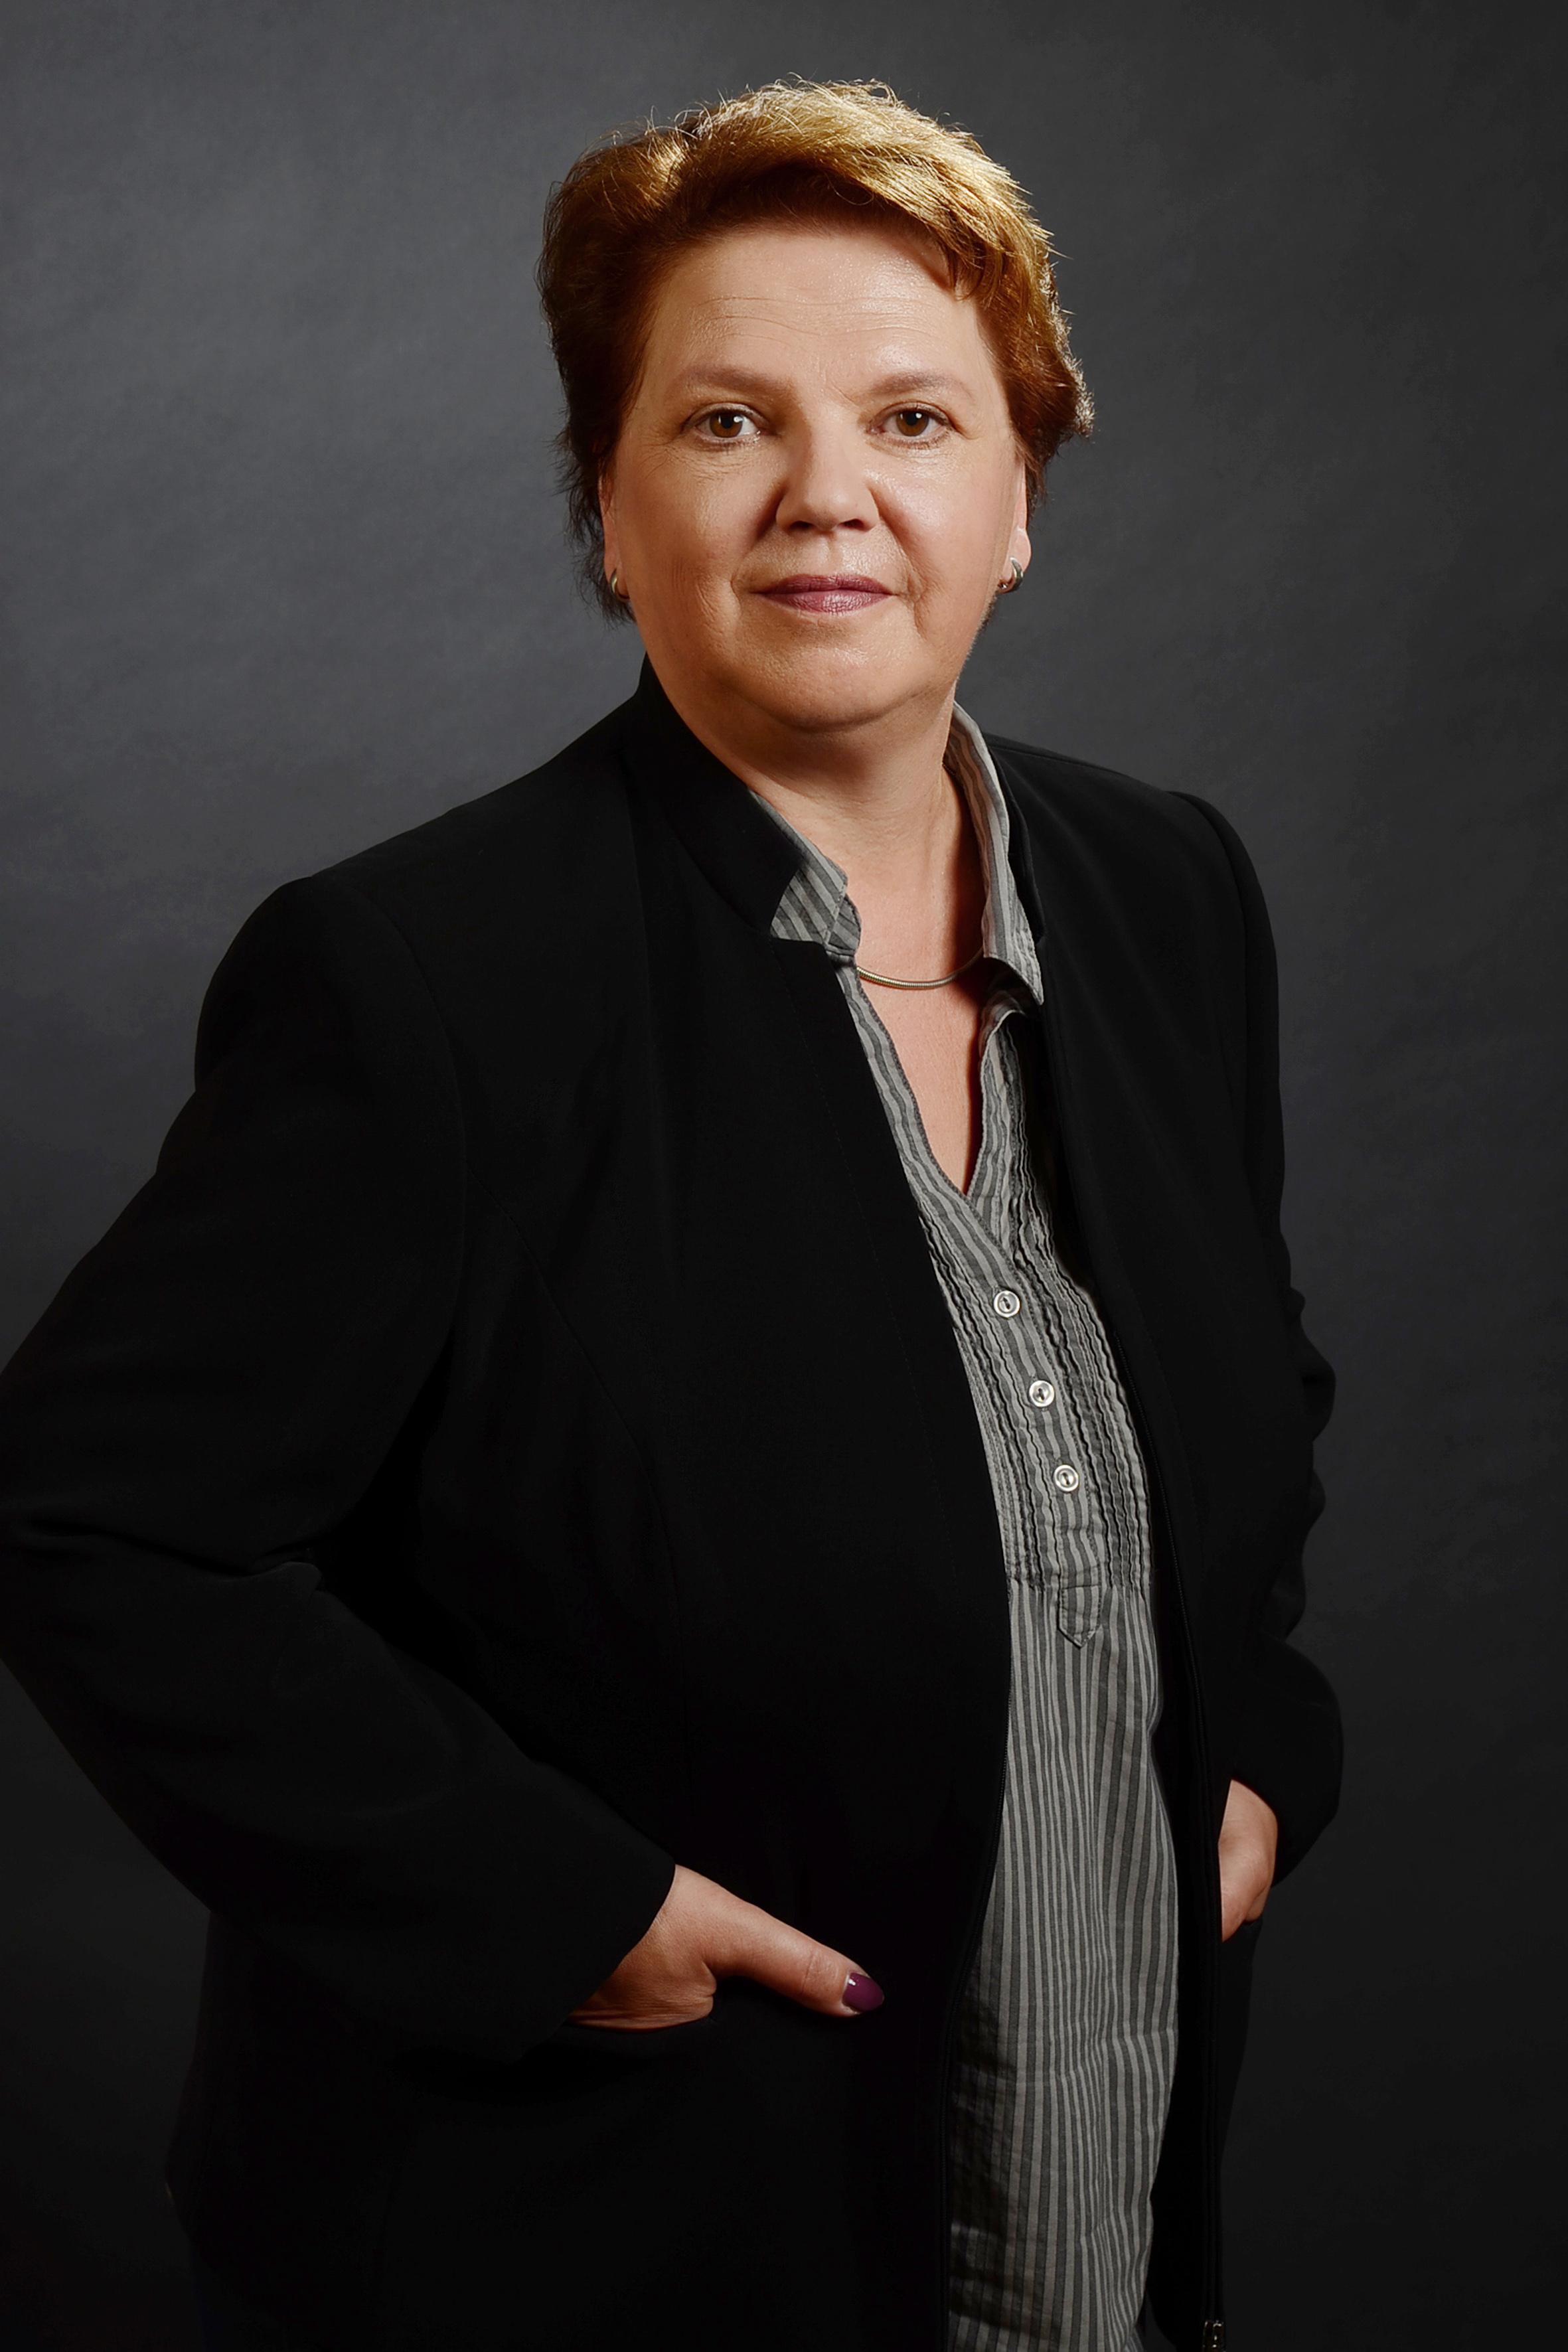 Ria Wendt